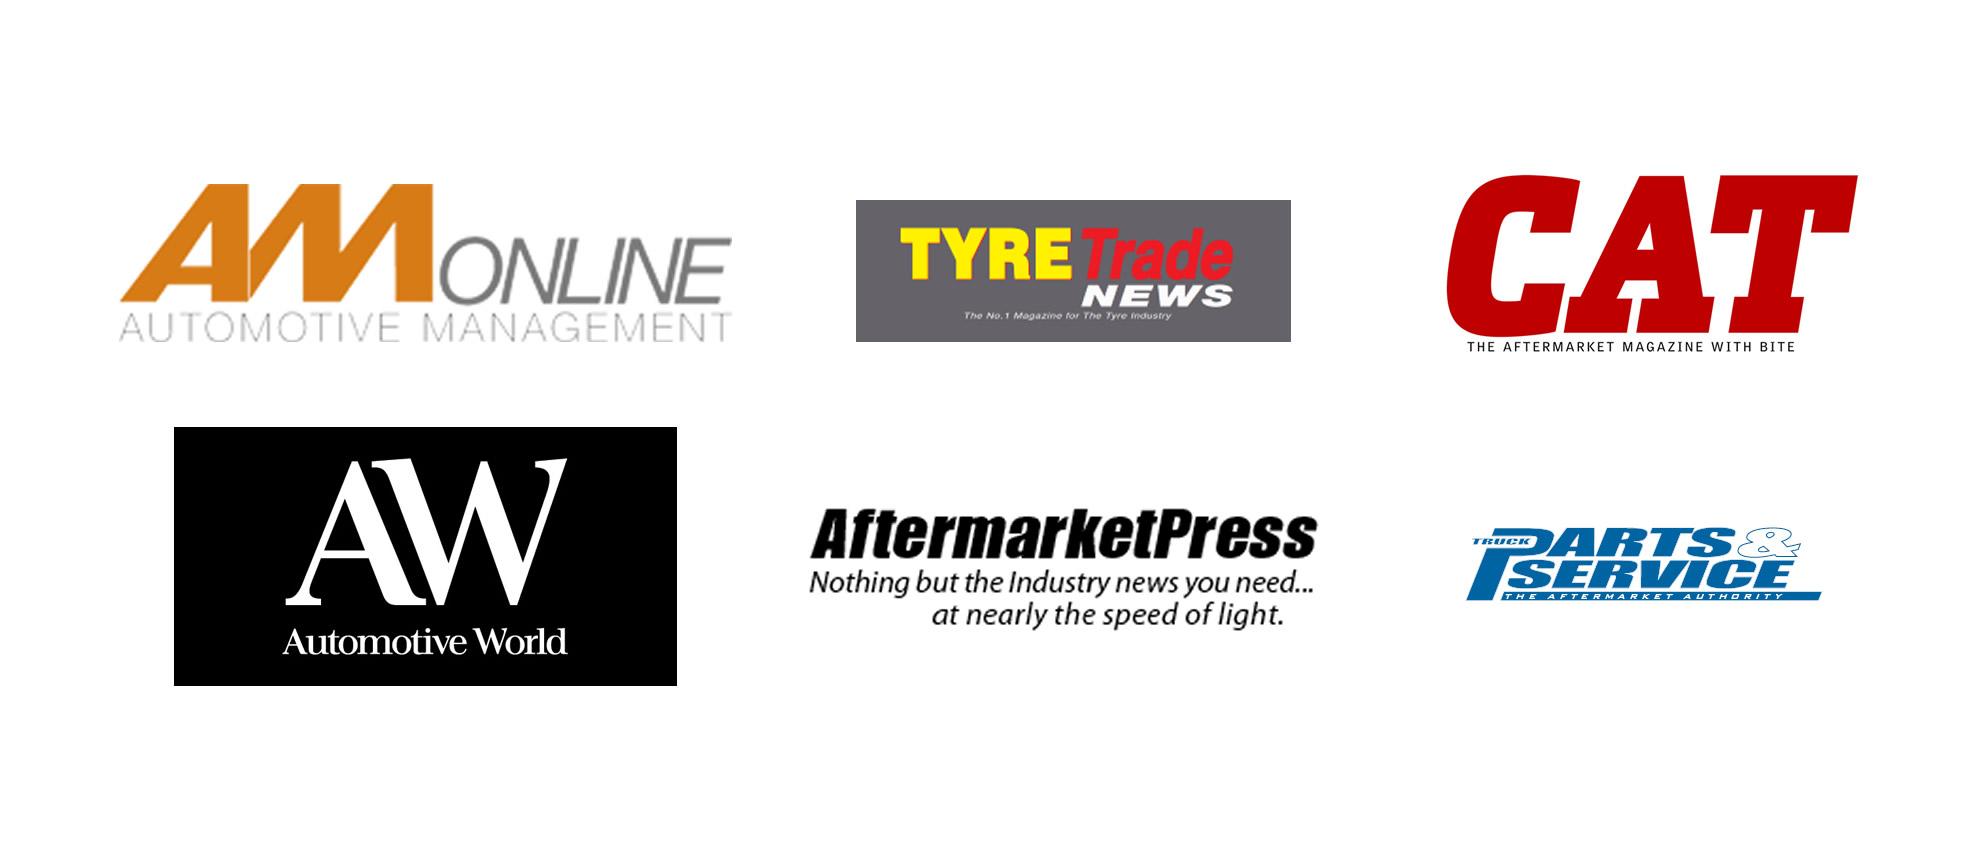 Automotive coverage